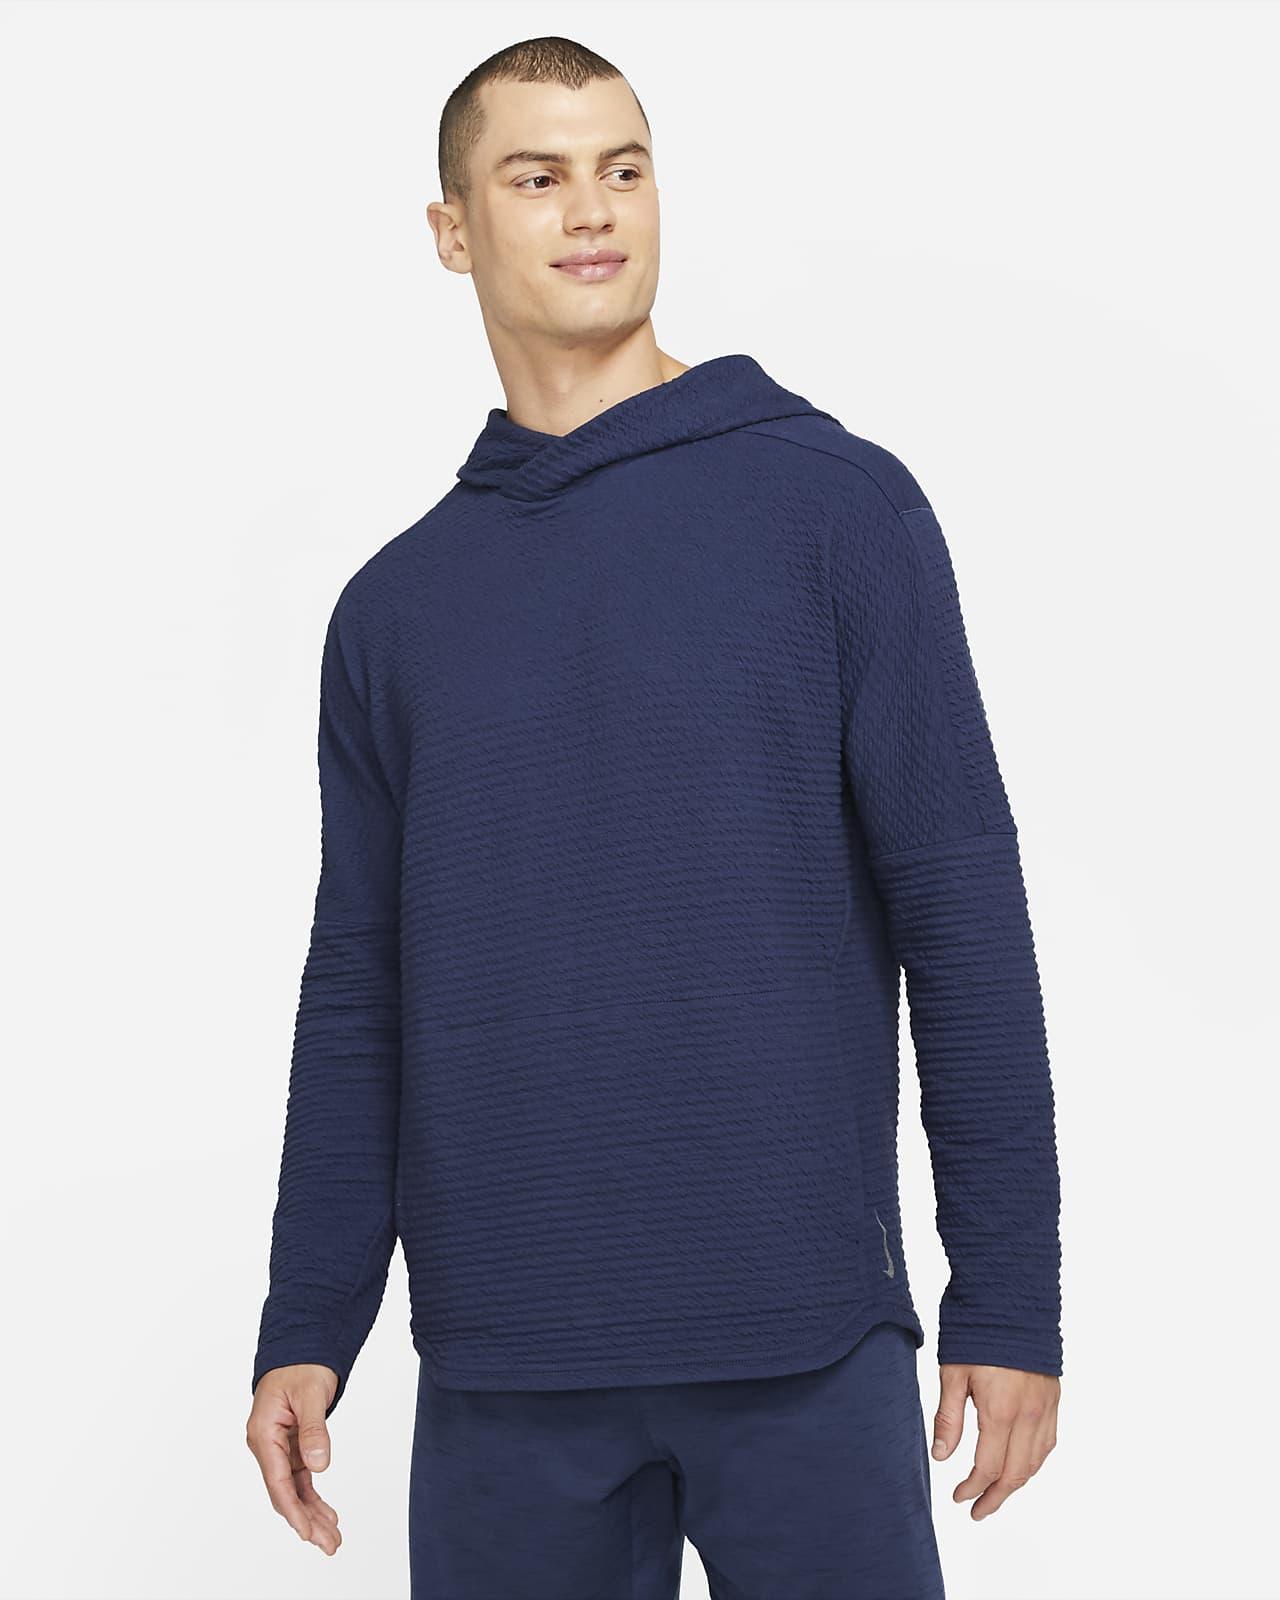 Felpa pullover con cappuccio Nike Yoga Nomad - Uomo